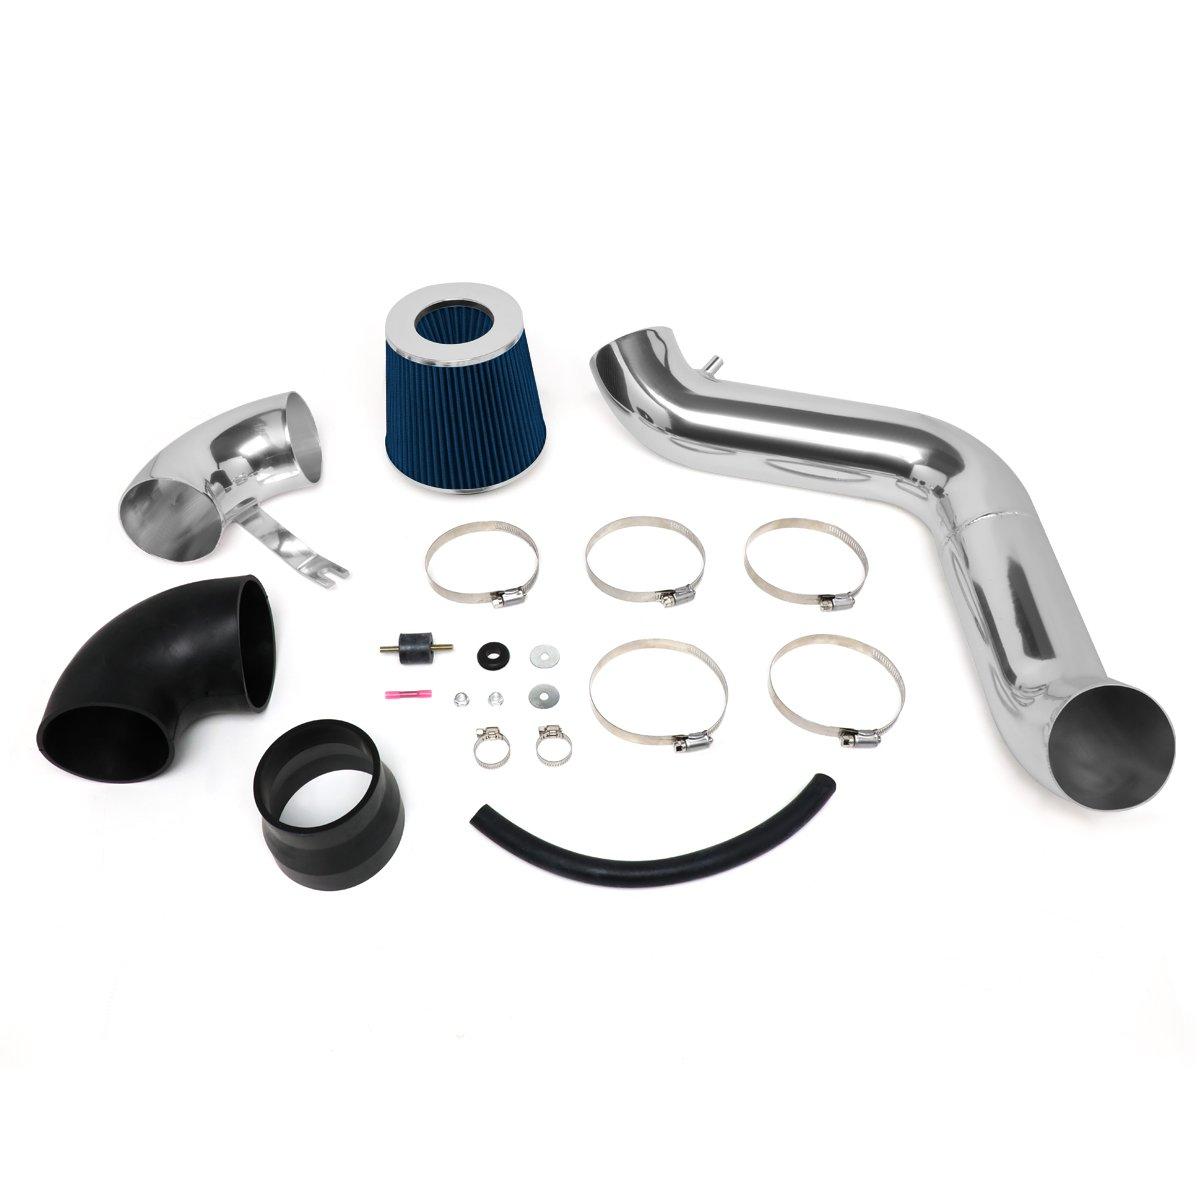 NewYall Engine Air Cleaner Intake Hose